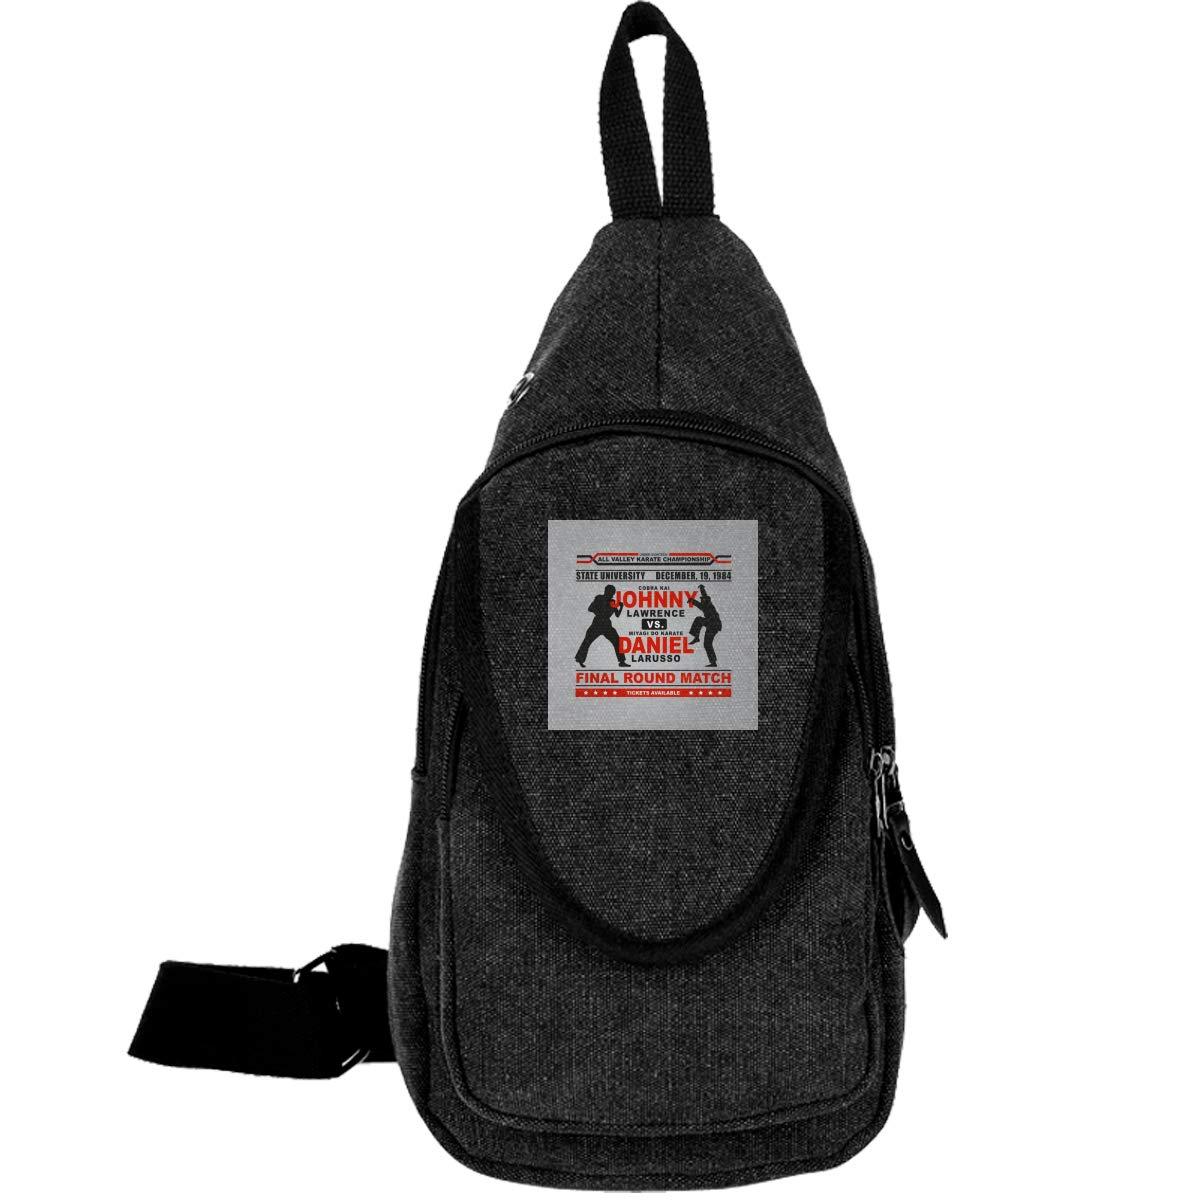 Karate Kid Johnny Vs Daniel Traveling Chest Bags For Men&Women Multipurpose Casual Daypack Hiking Shoulder Bag by BIZHUDP